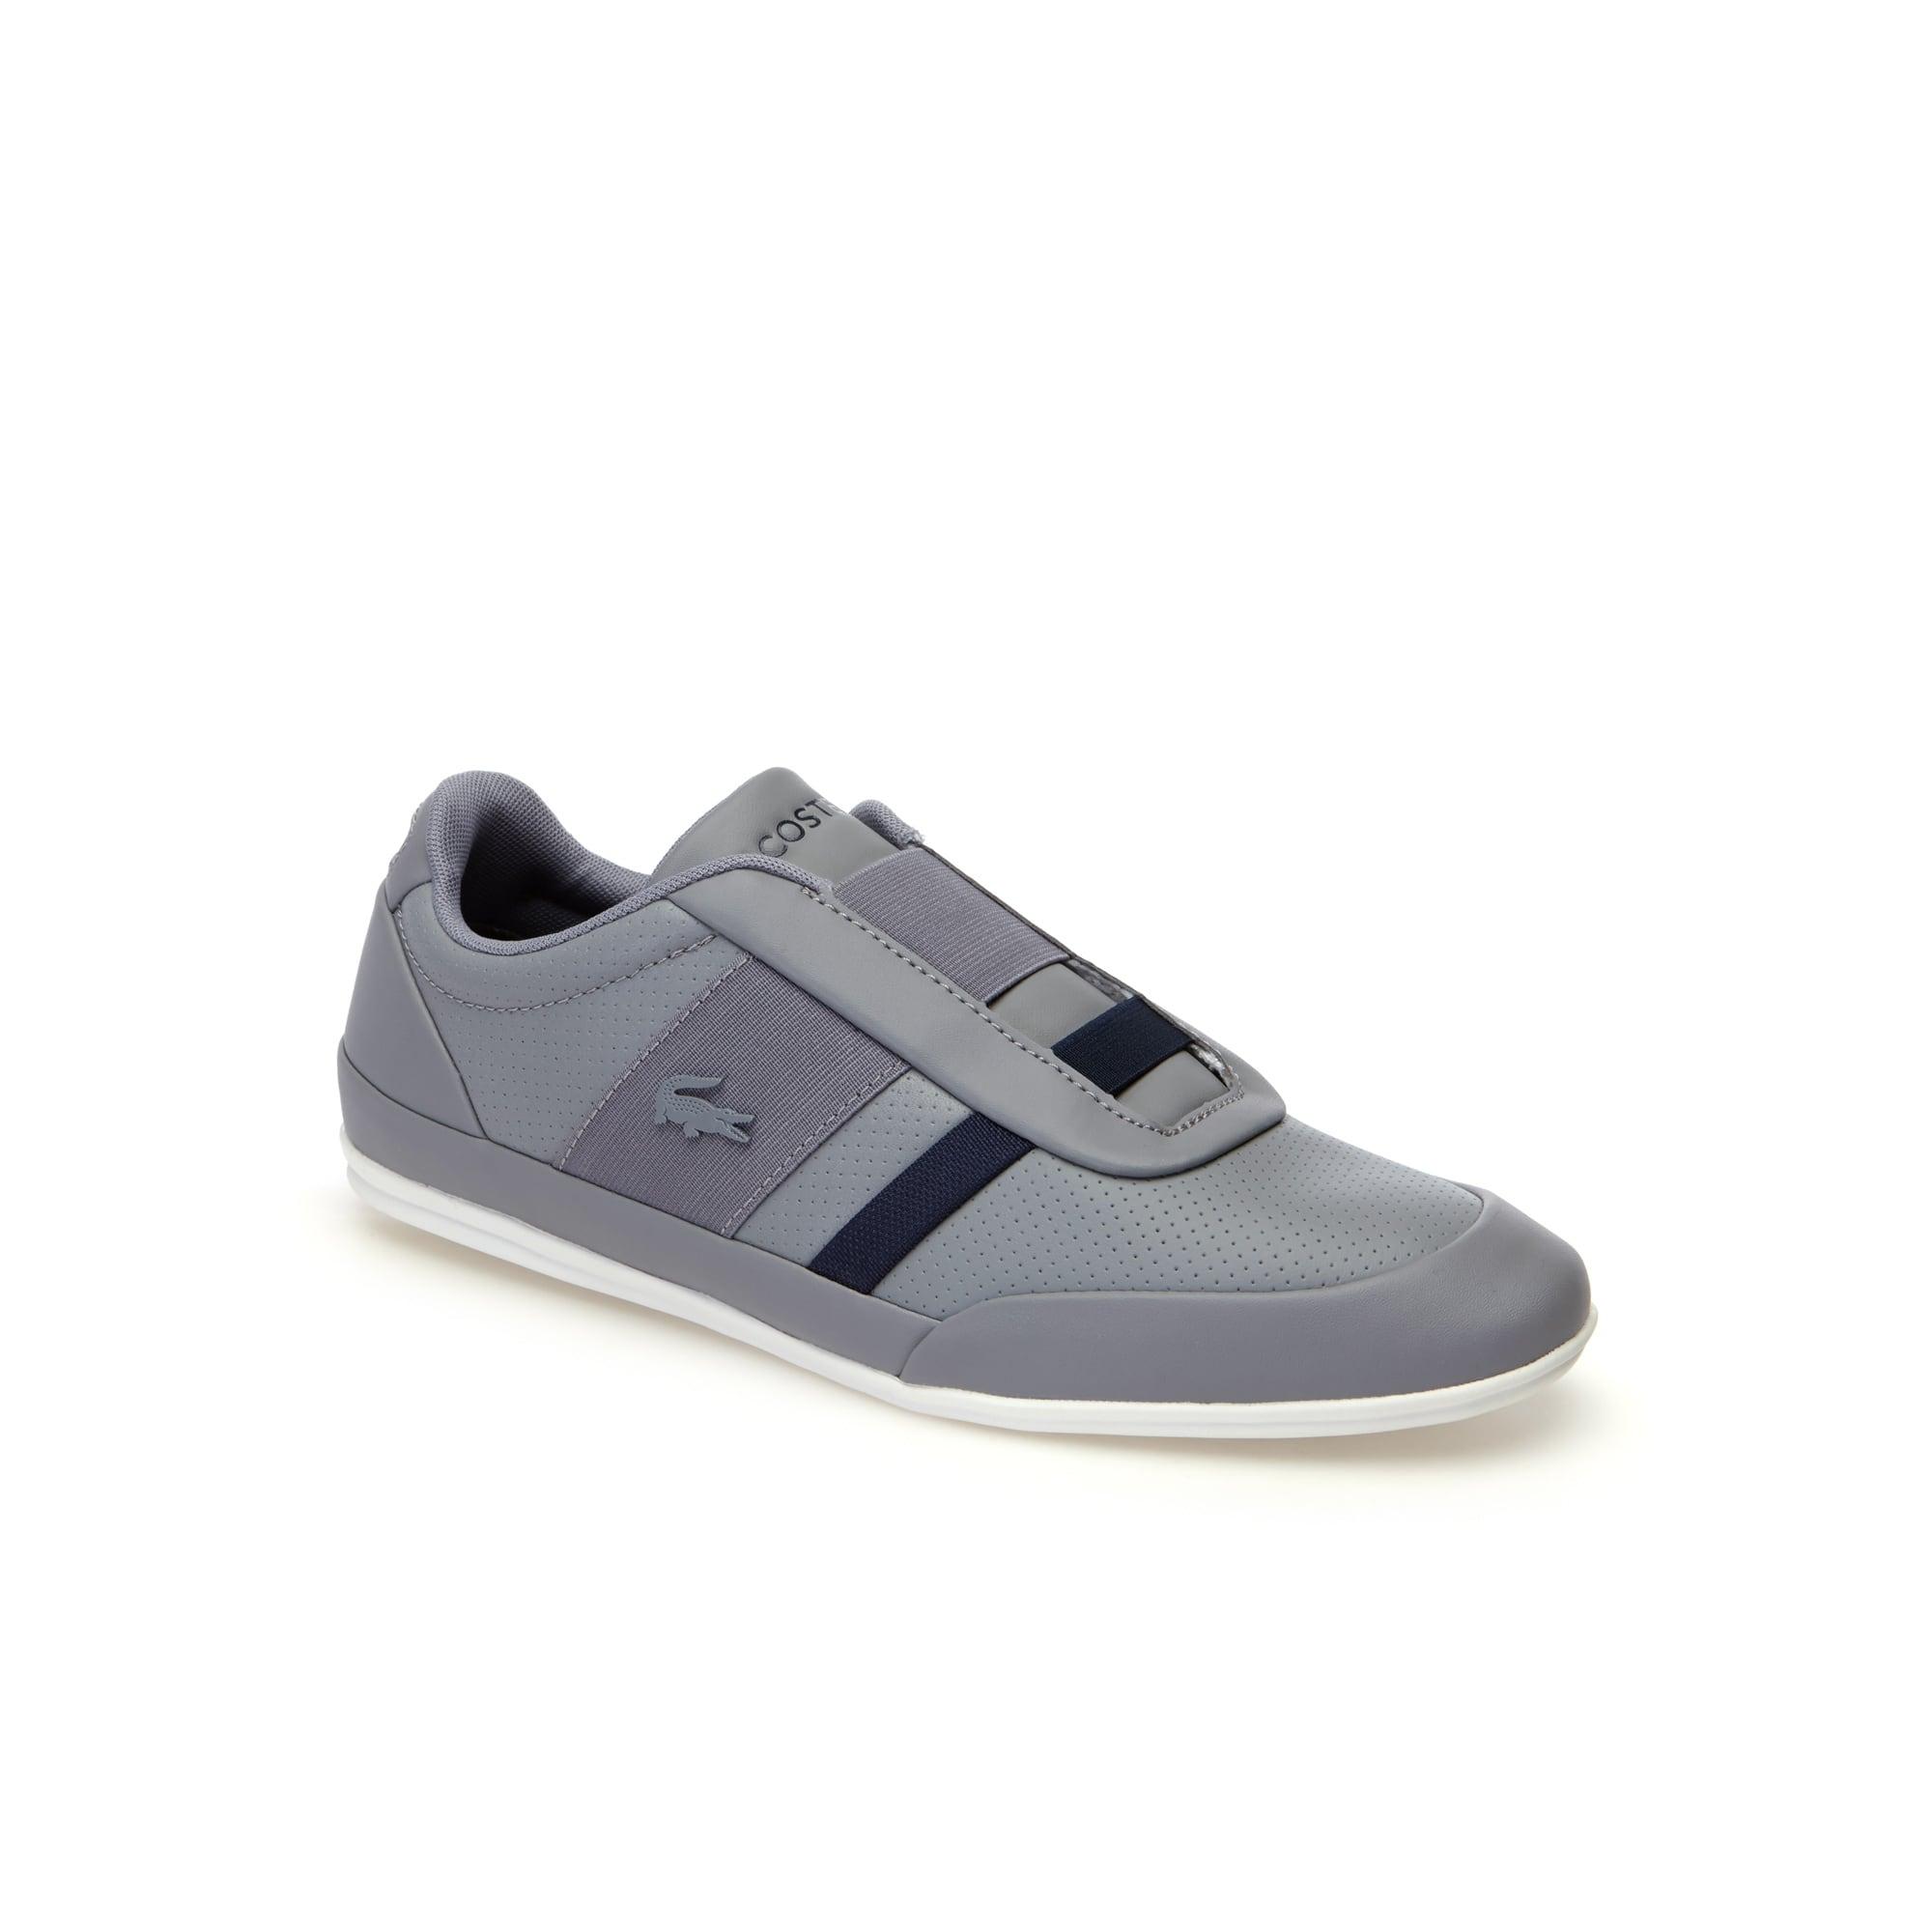 59cae467a709 Men s Shoes on Sale